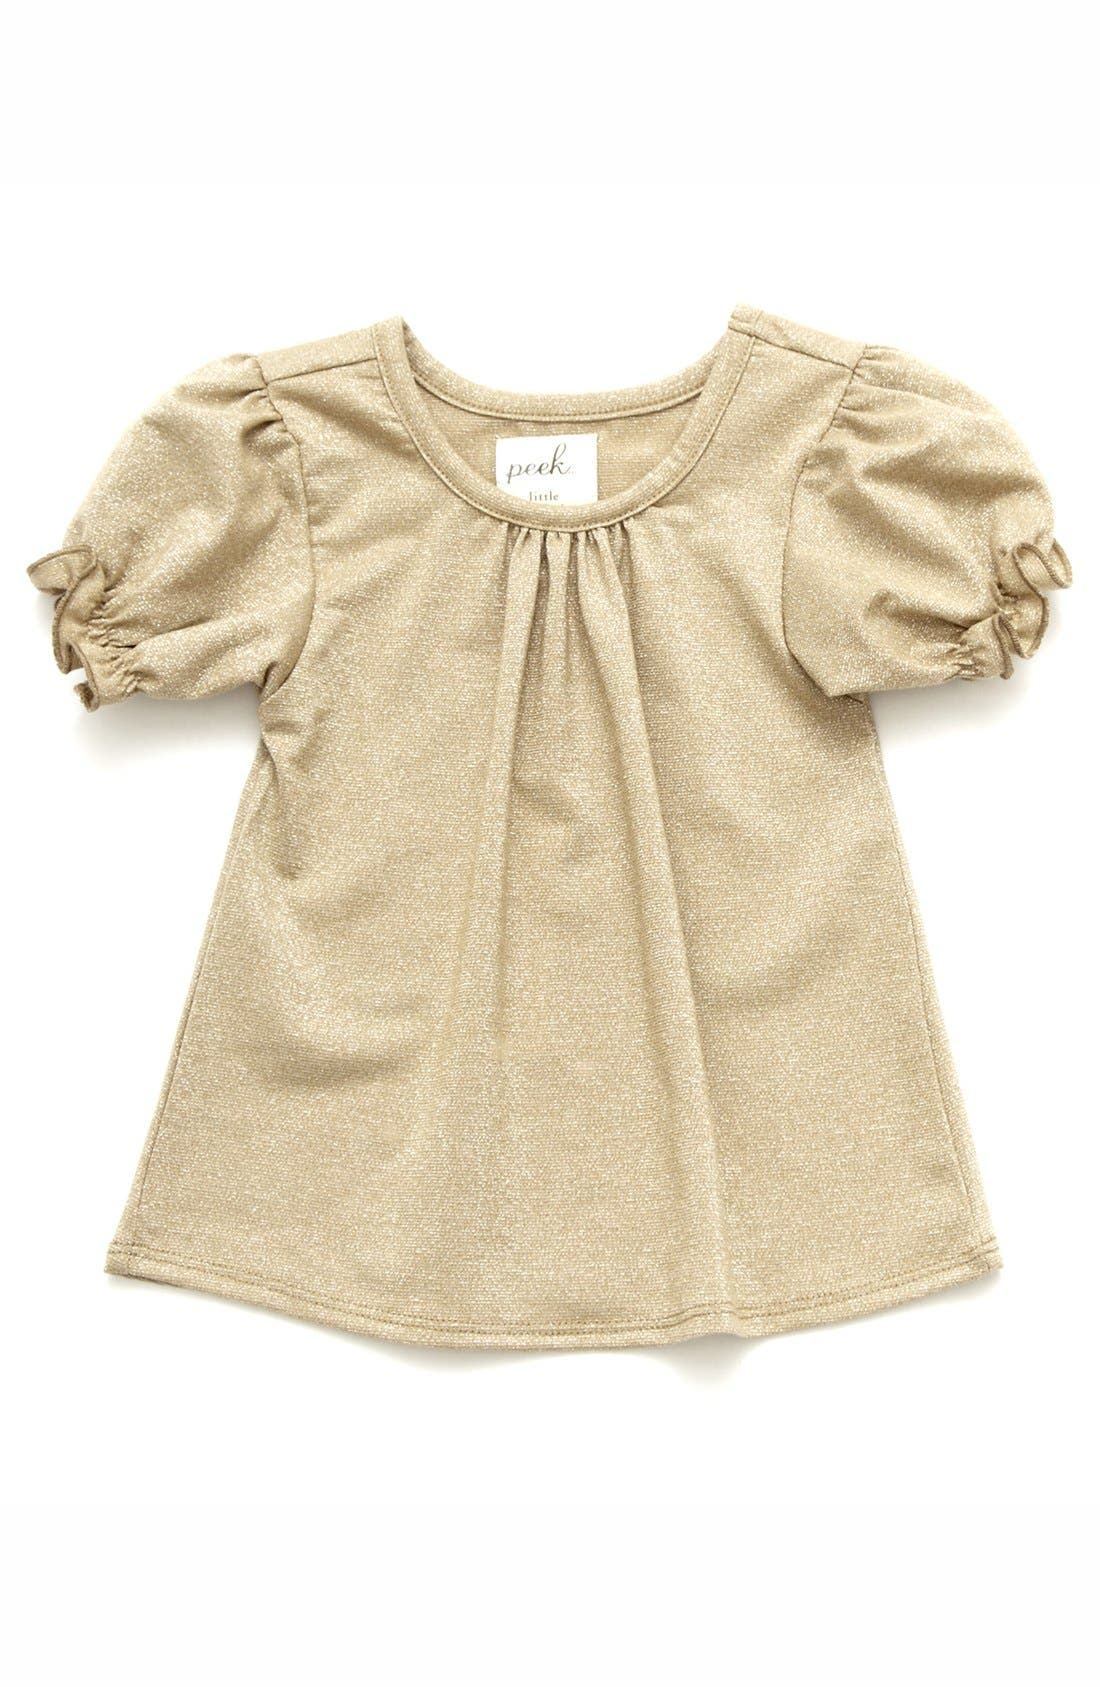 Main Image - Peek 'New Royal' Tee (Baby Girls)